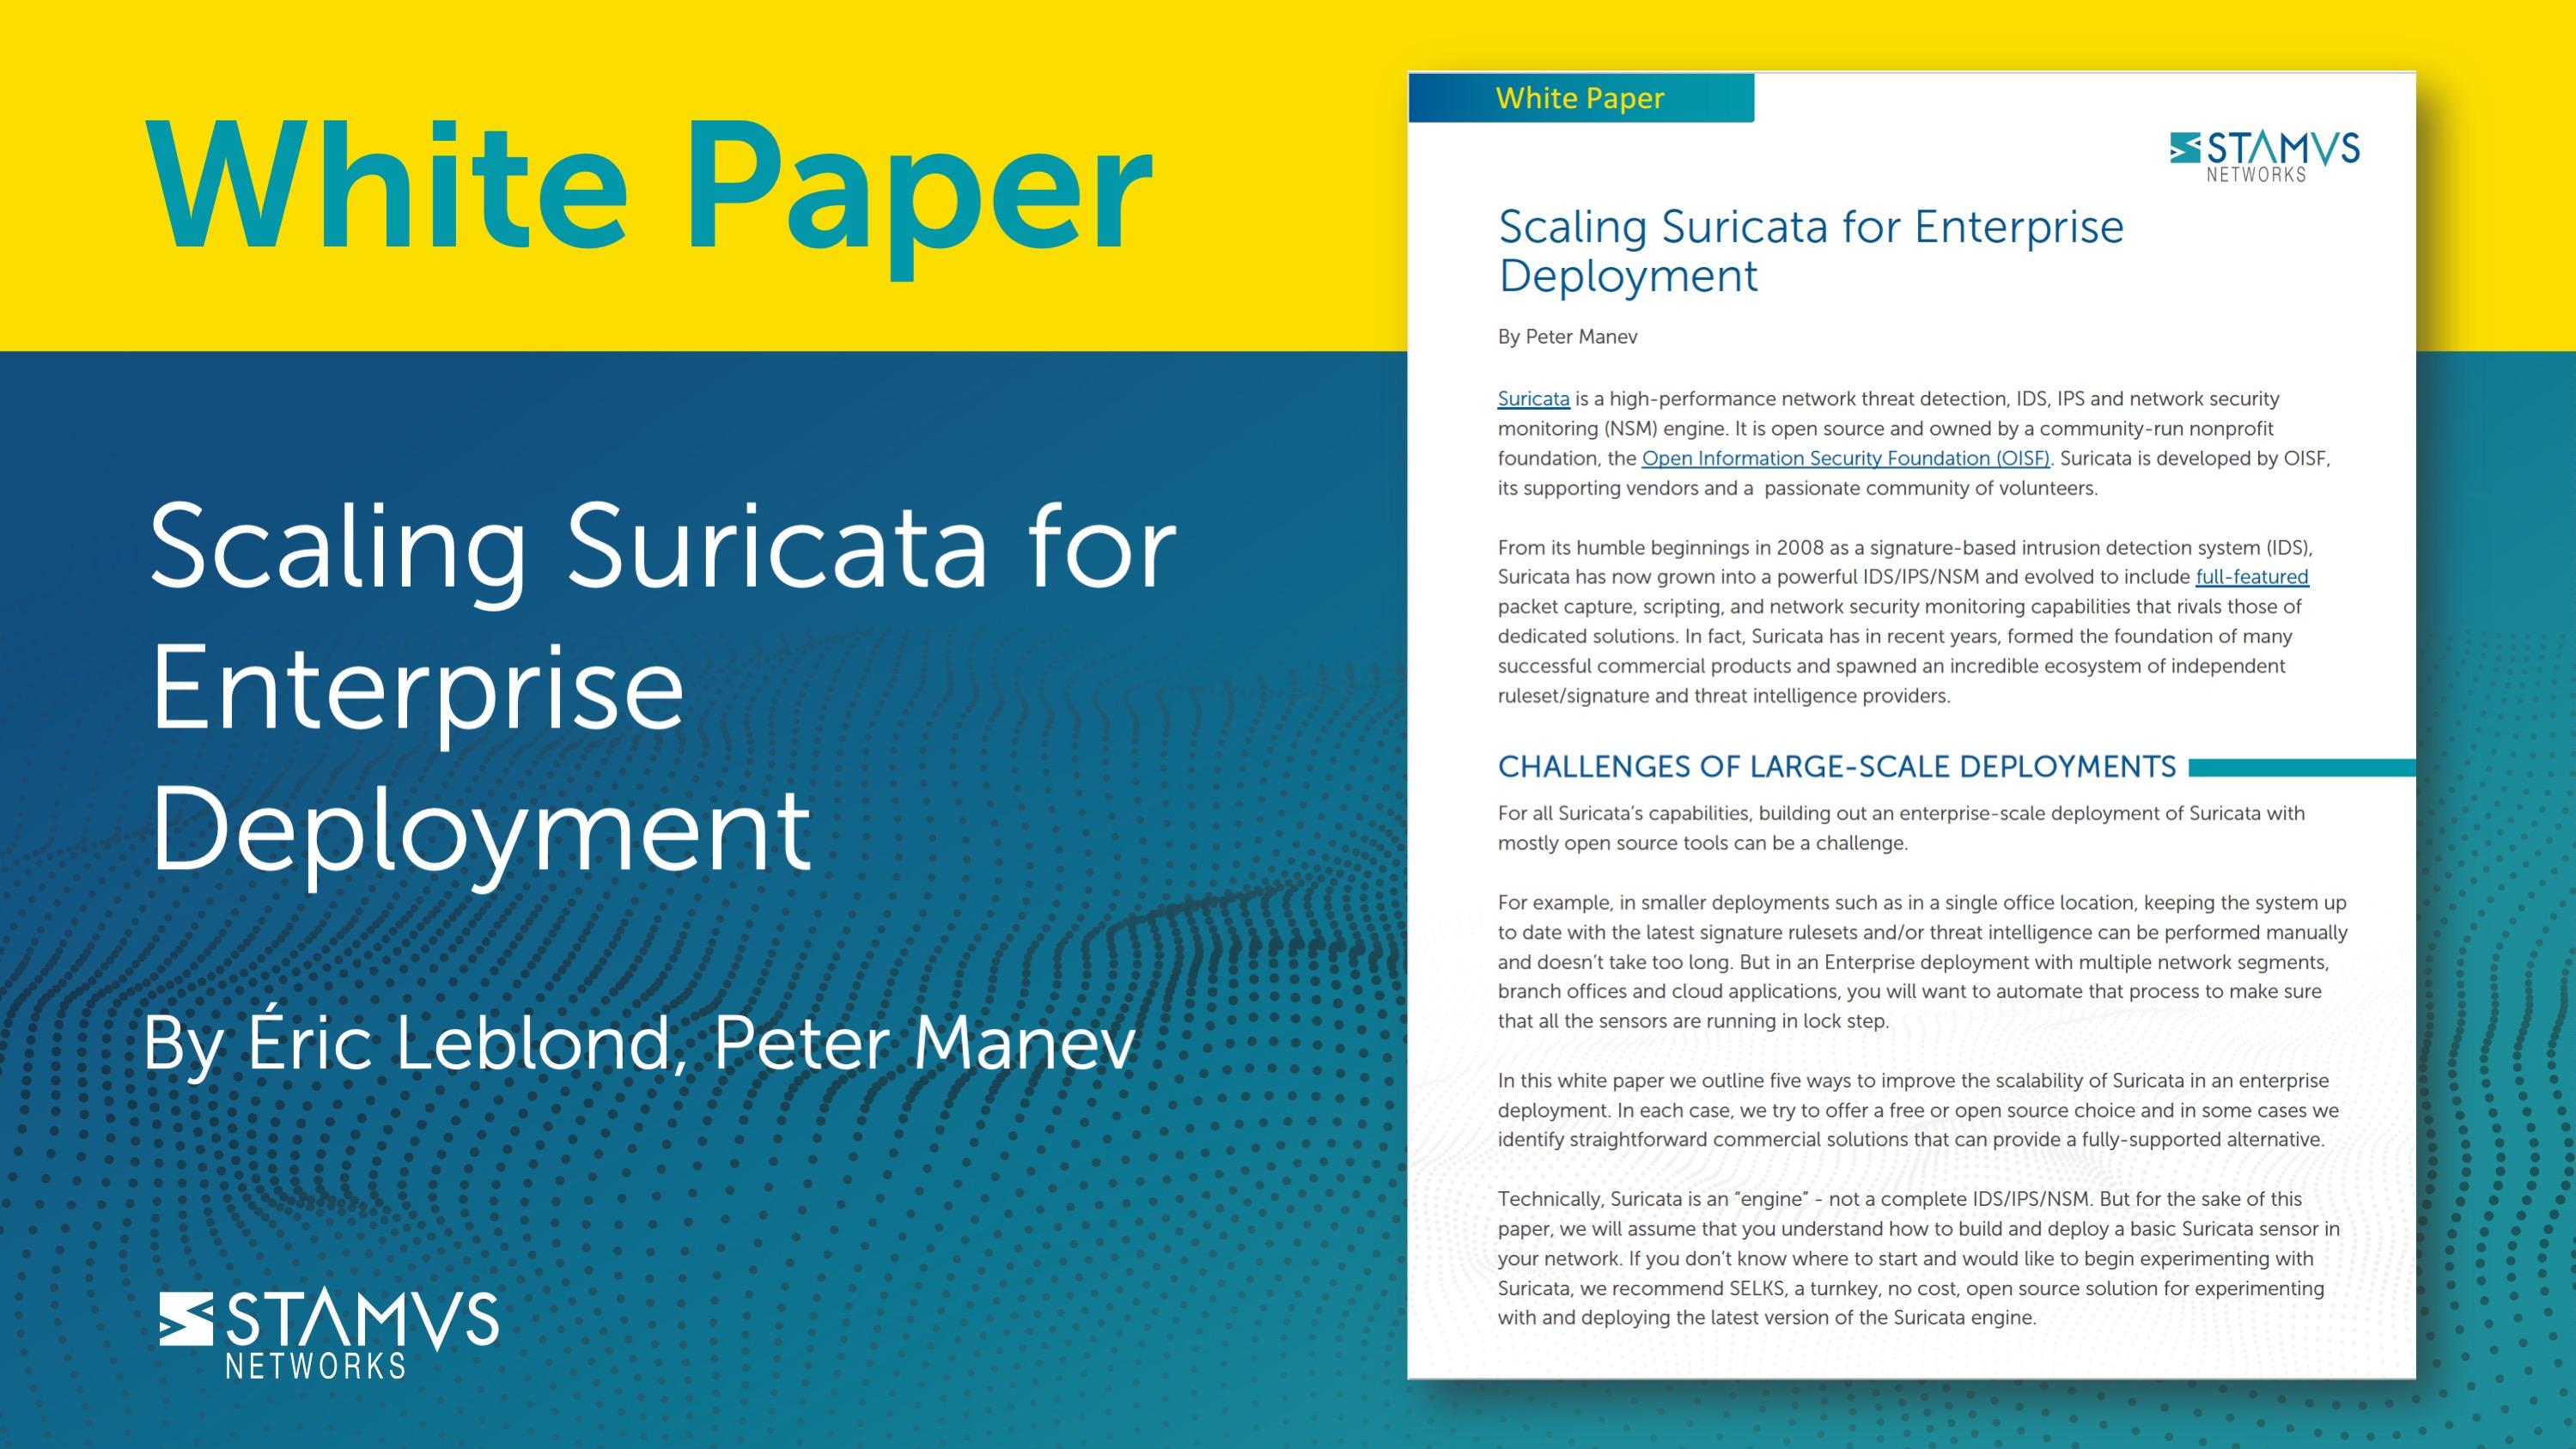 Scaling Suricata for Enterprise Deployment